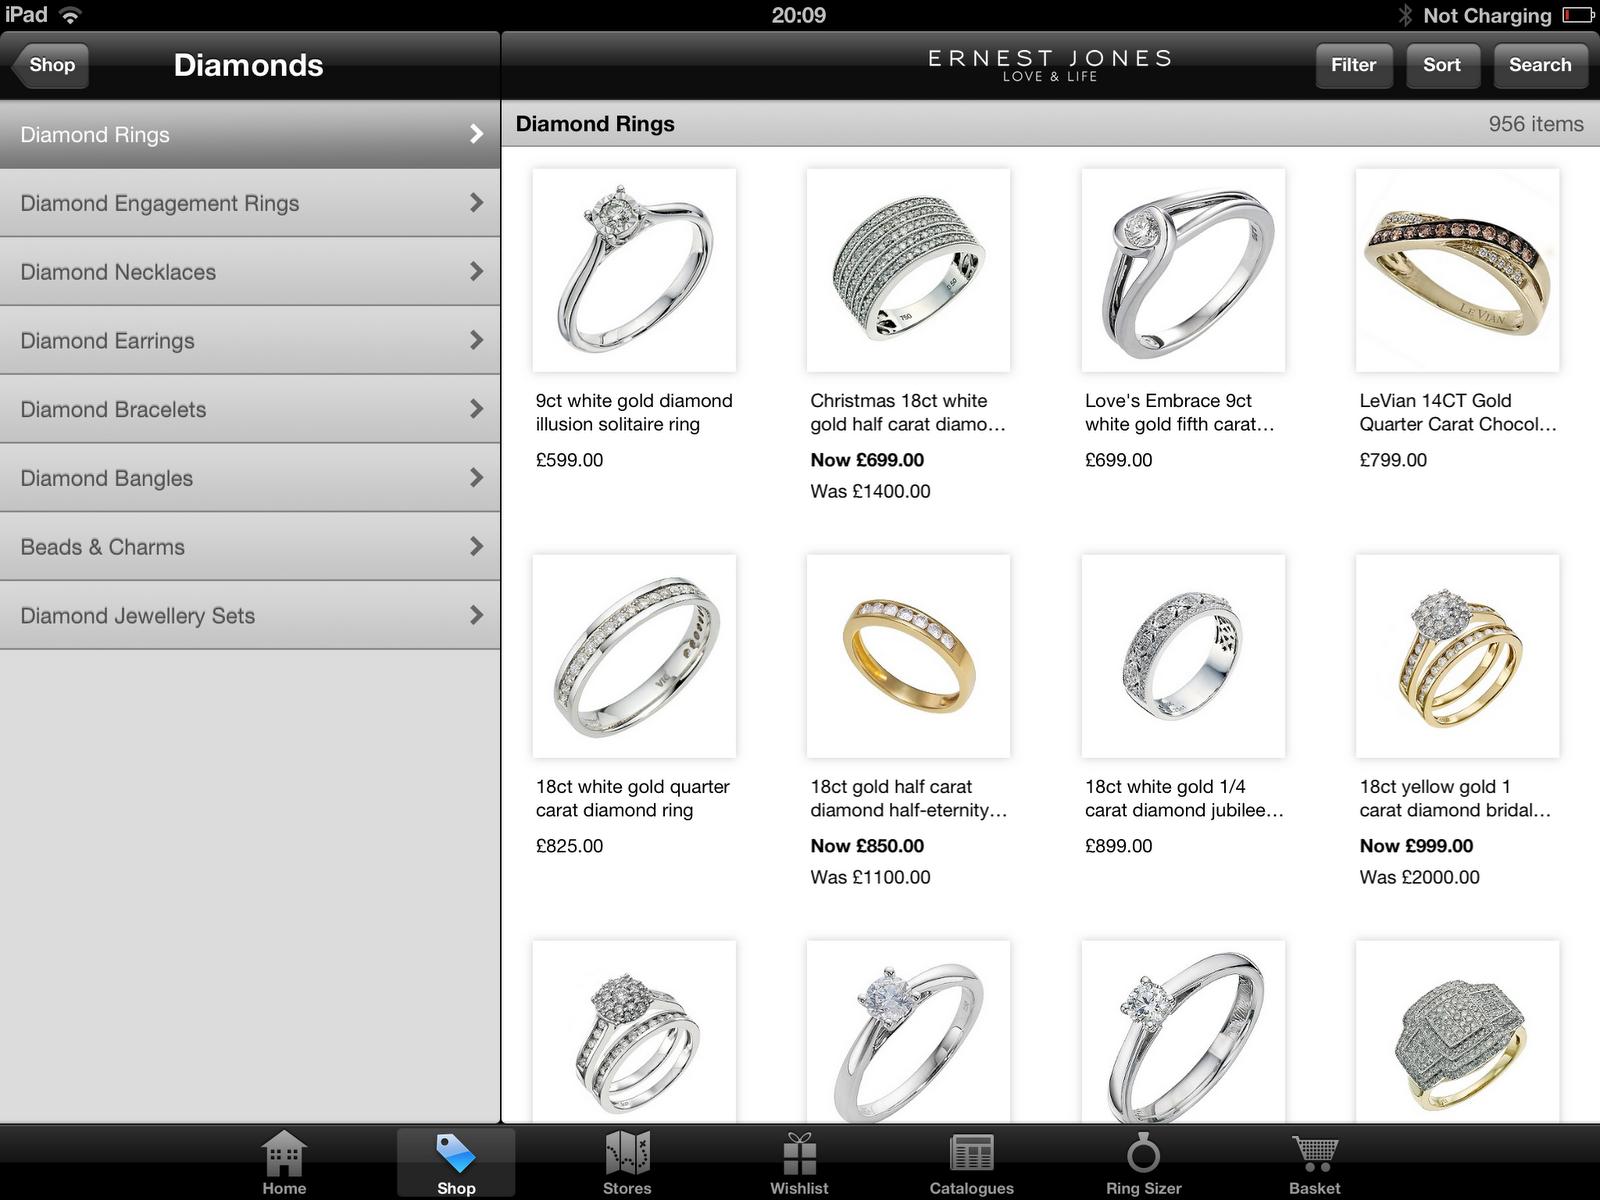 Ernest Jones Diamond Rings Sale